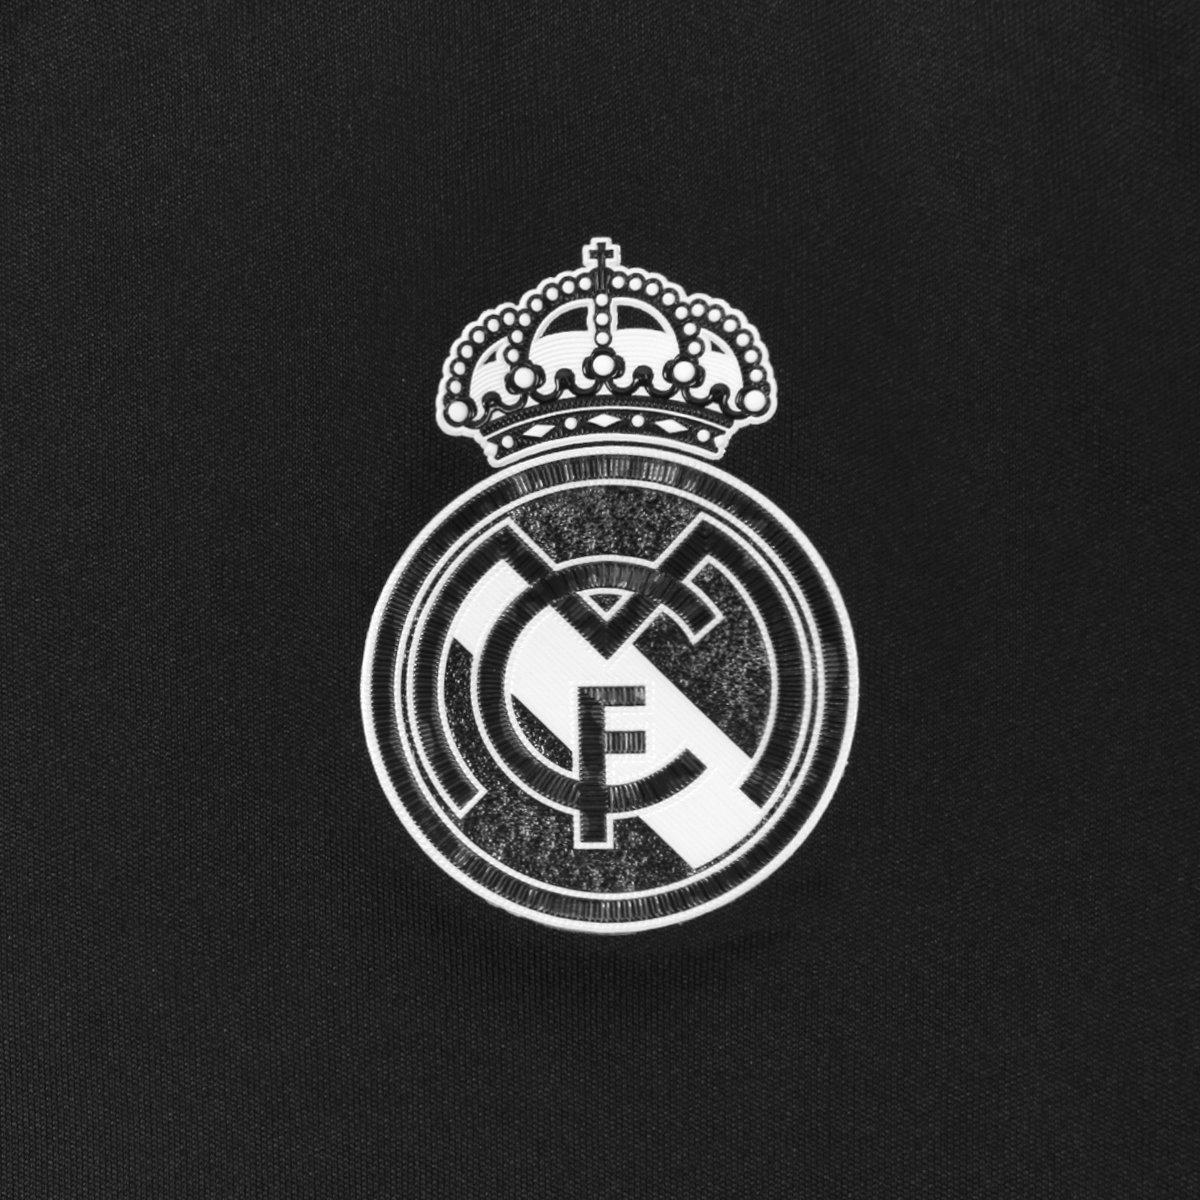 Camisa Real Madrid Infantil Third 16 17 s nº Torcedor Adidas ... 1de75a69fd640